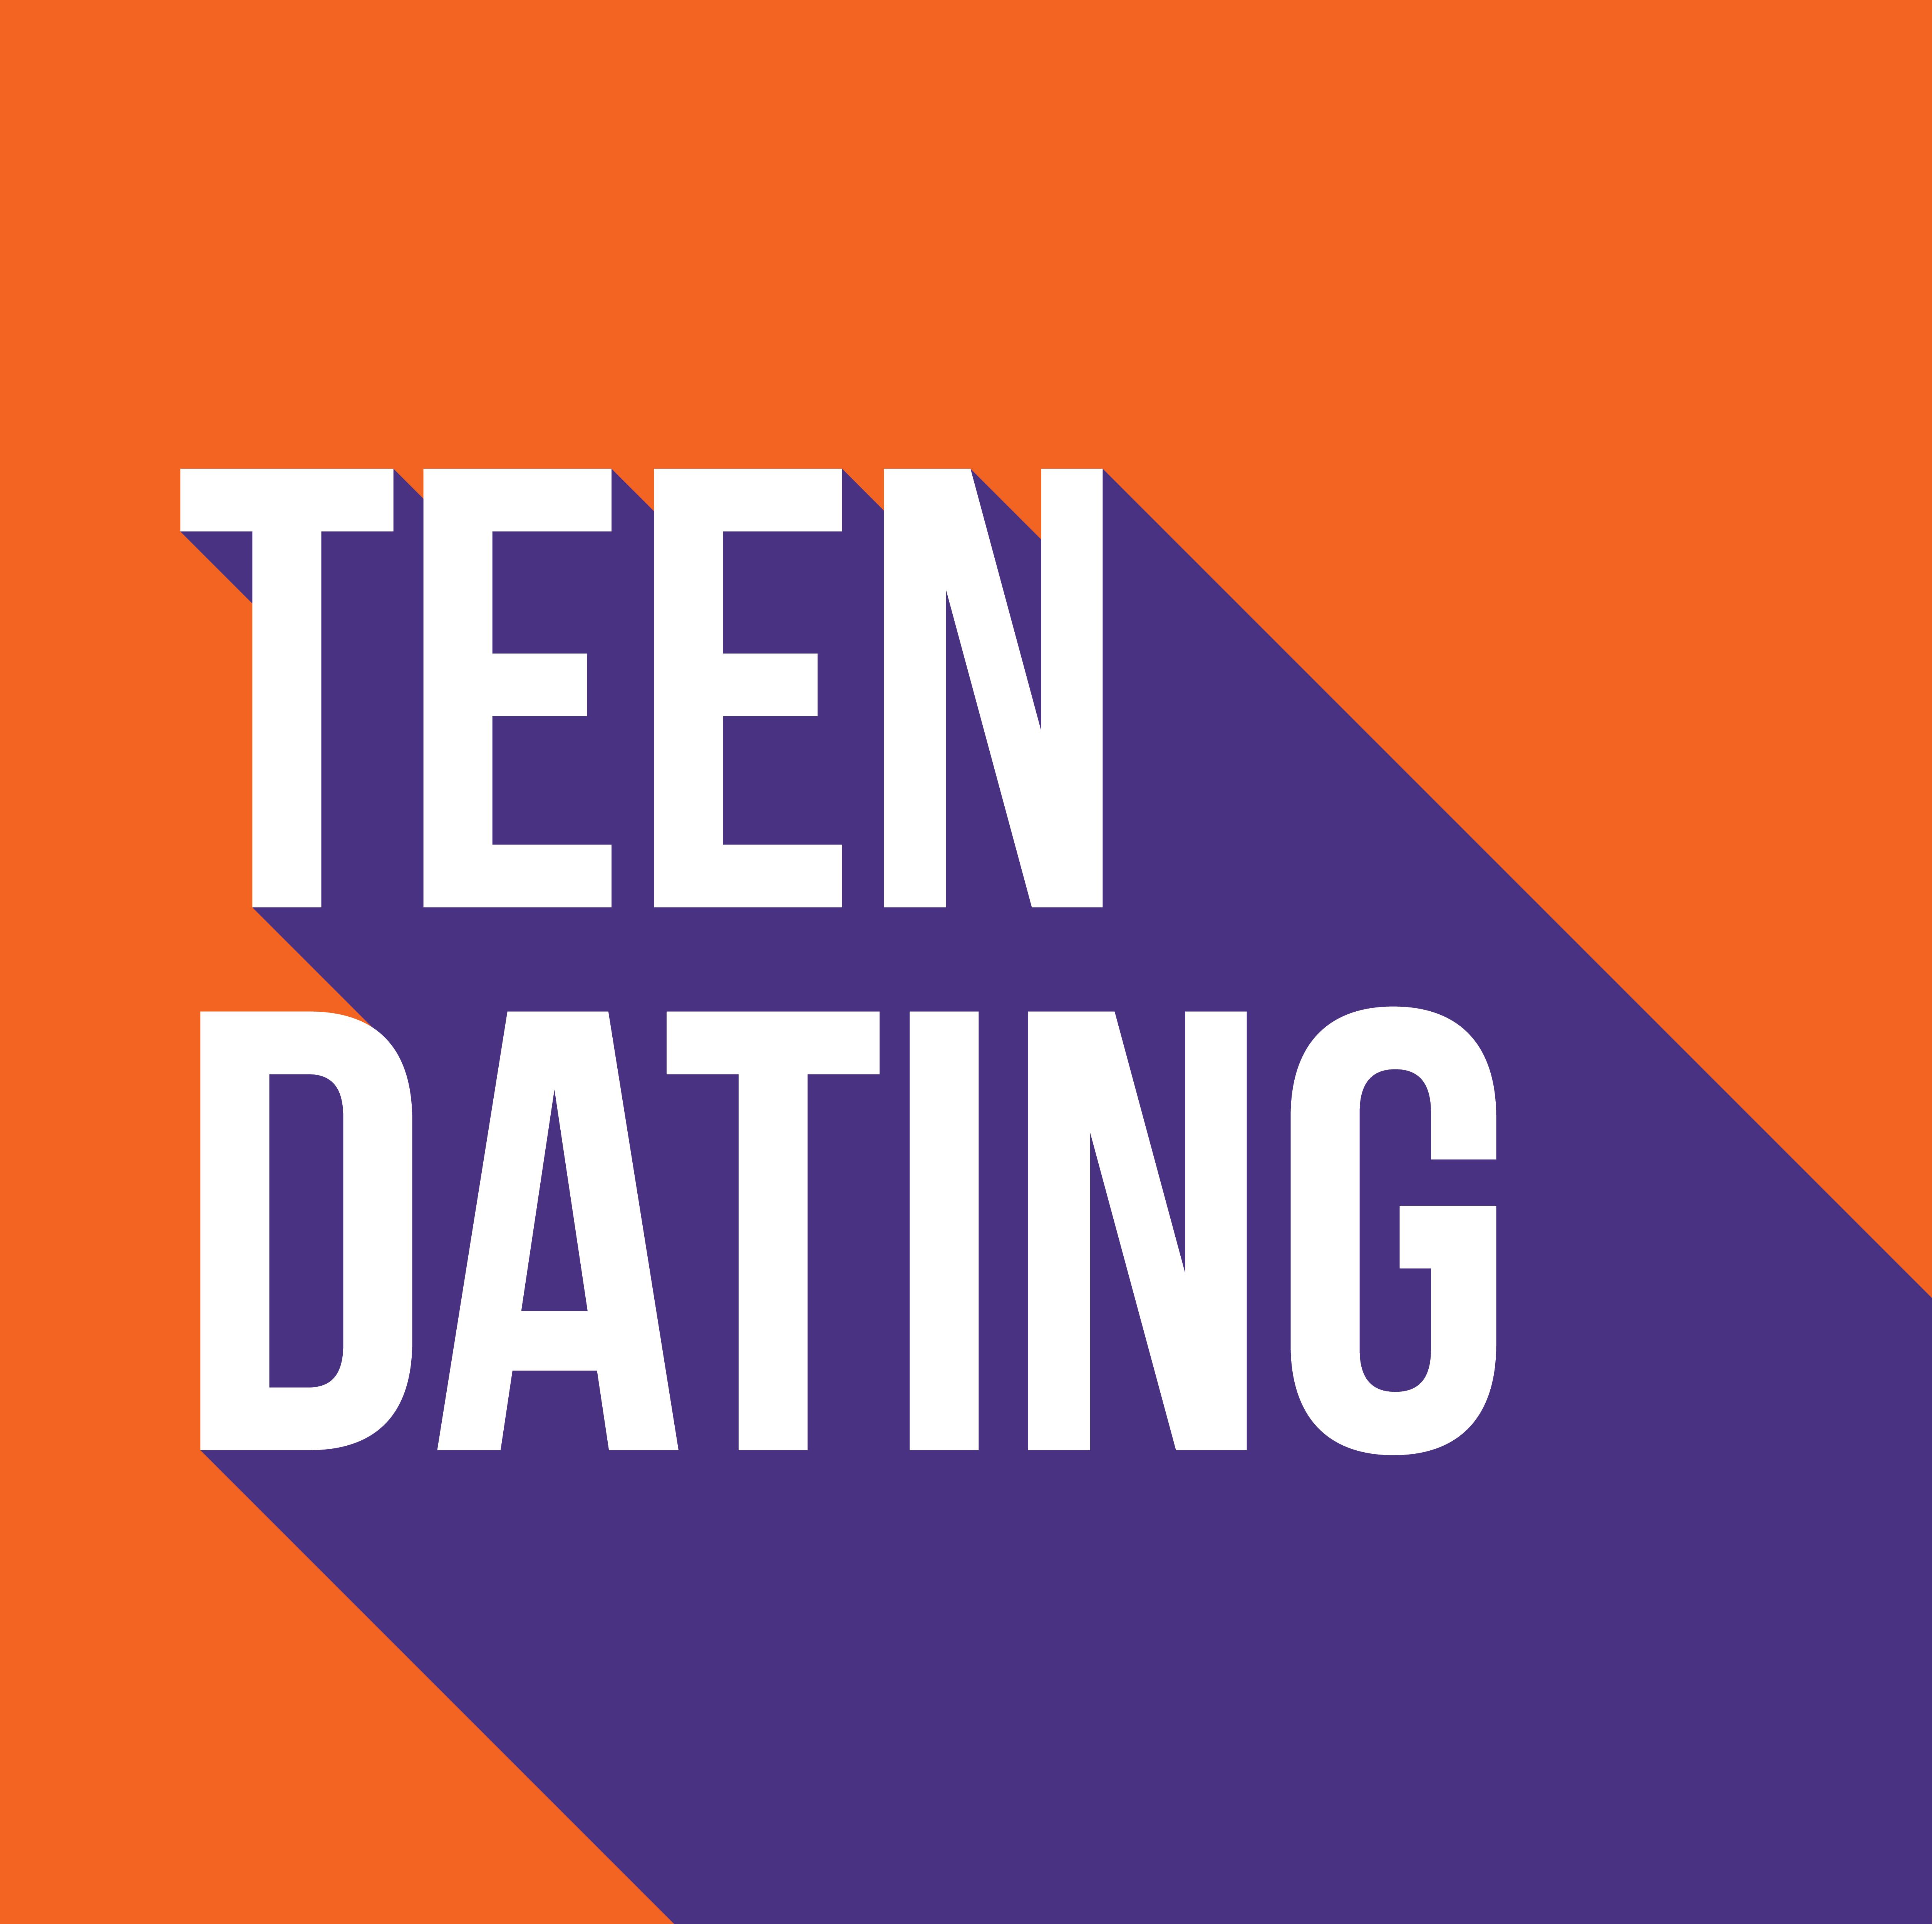 Teen Dating